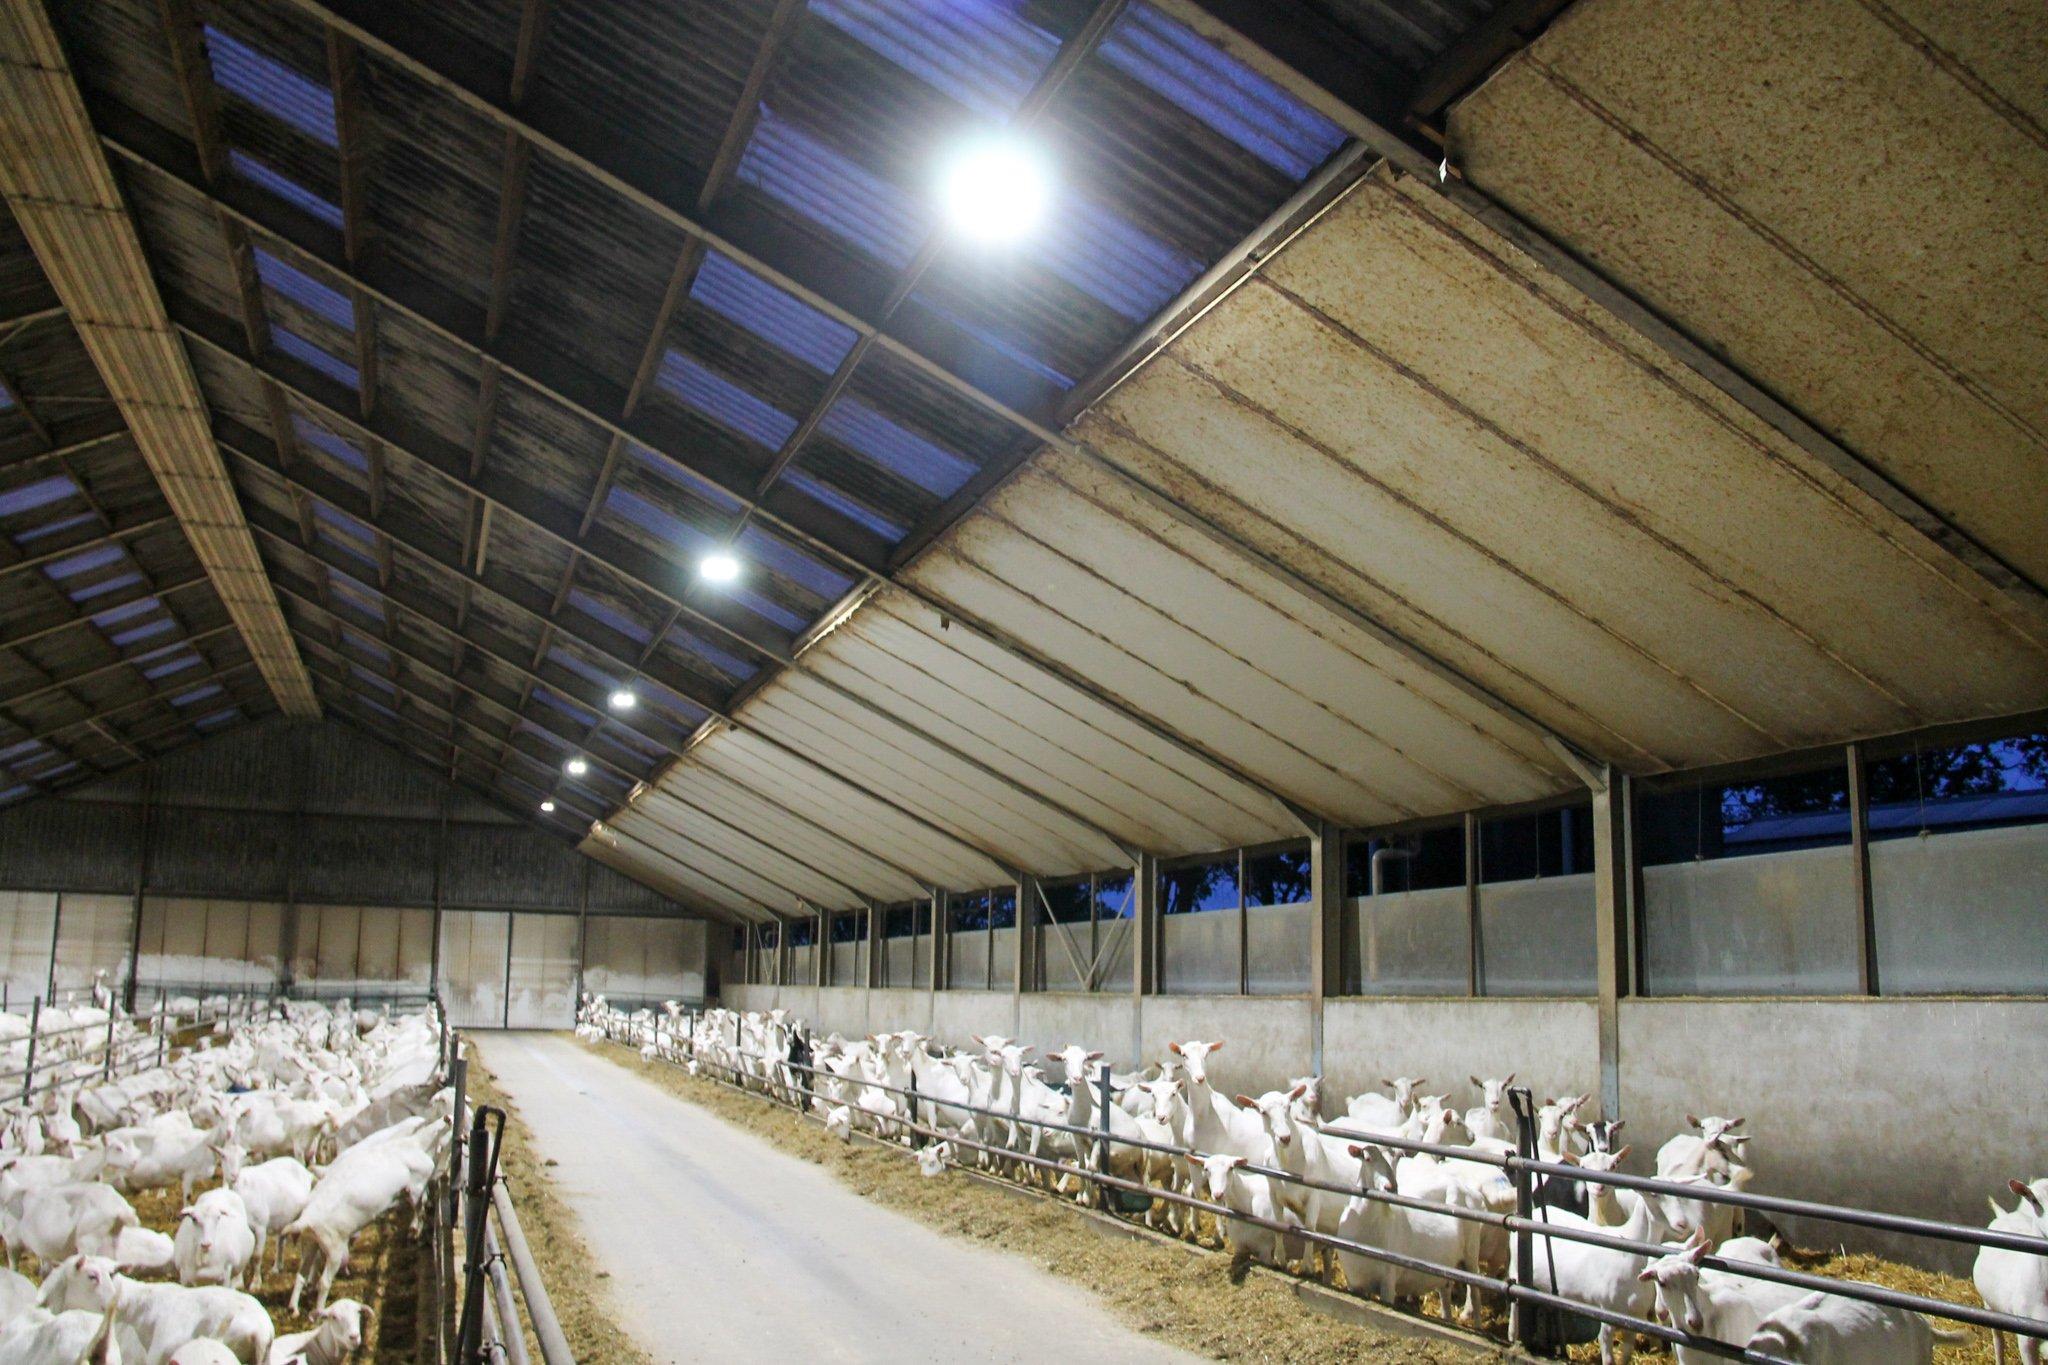 led-verlichting-stal-boerderij